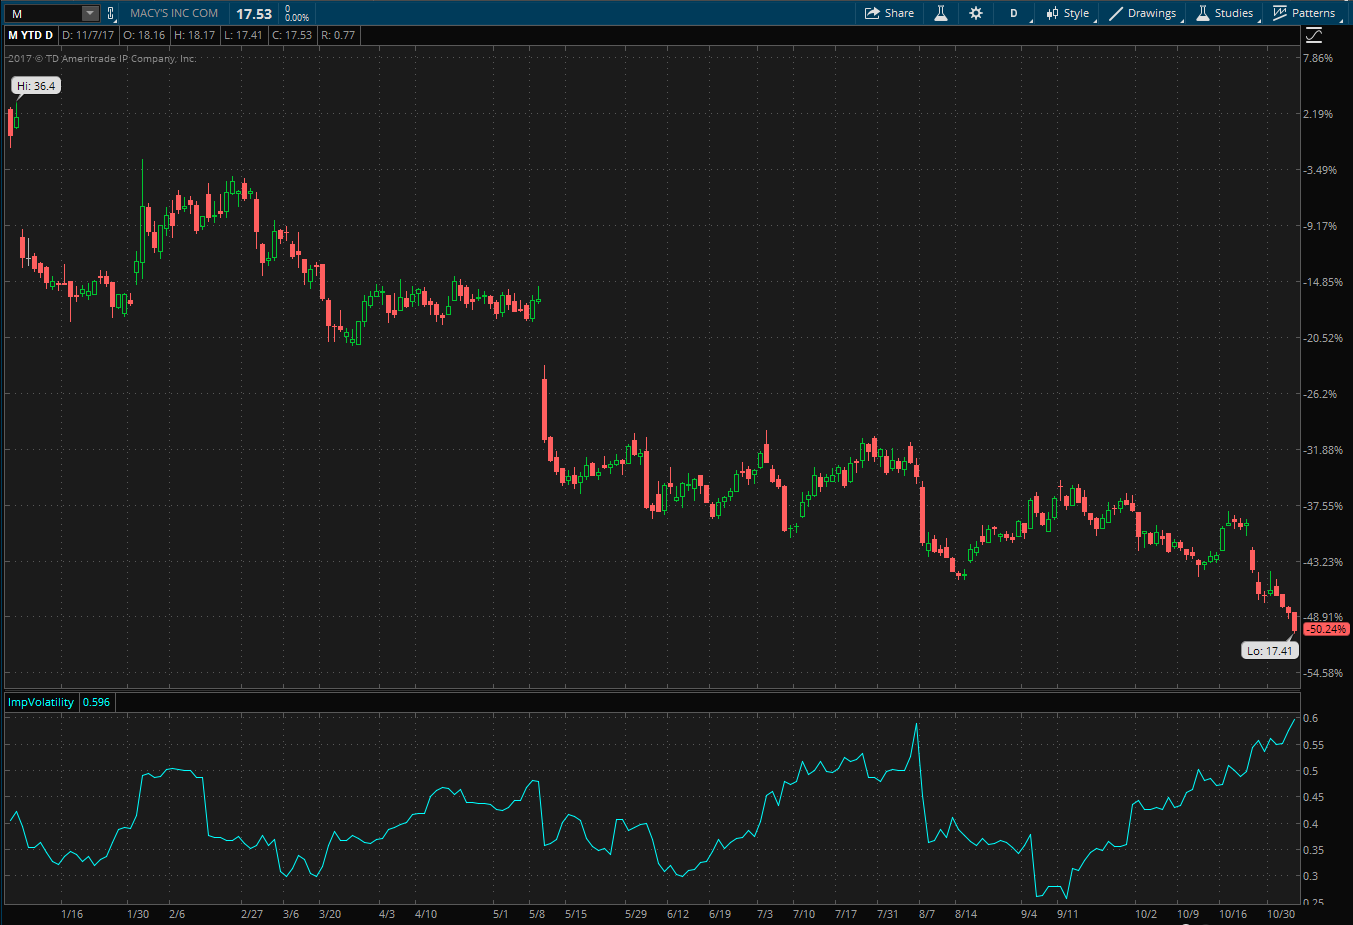 Macy's stock ytd performance and implied volatility shown on the thinkorswim platform